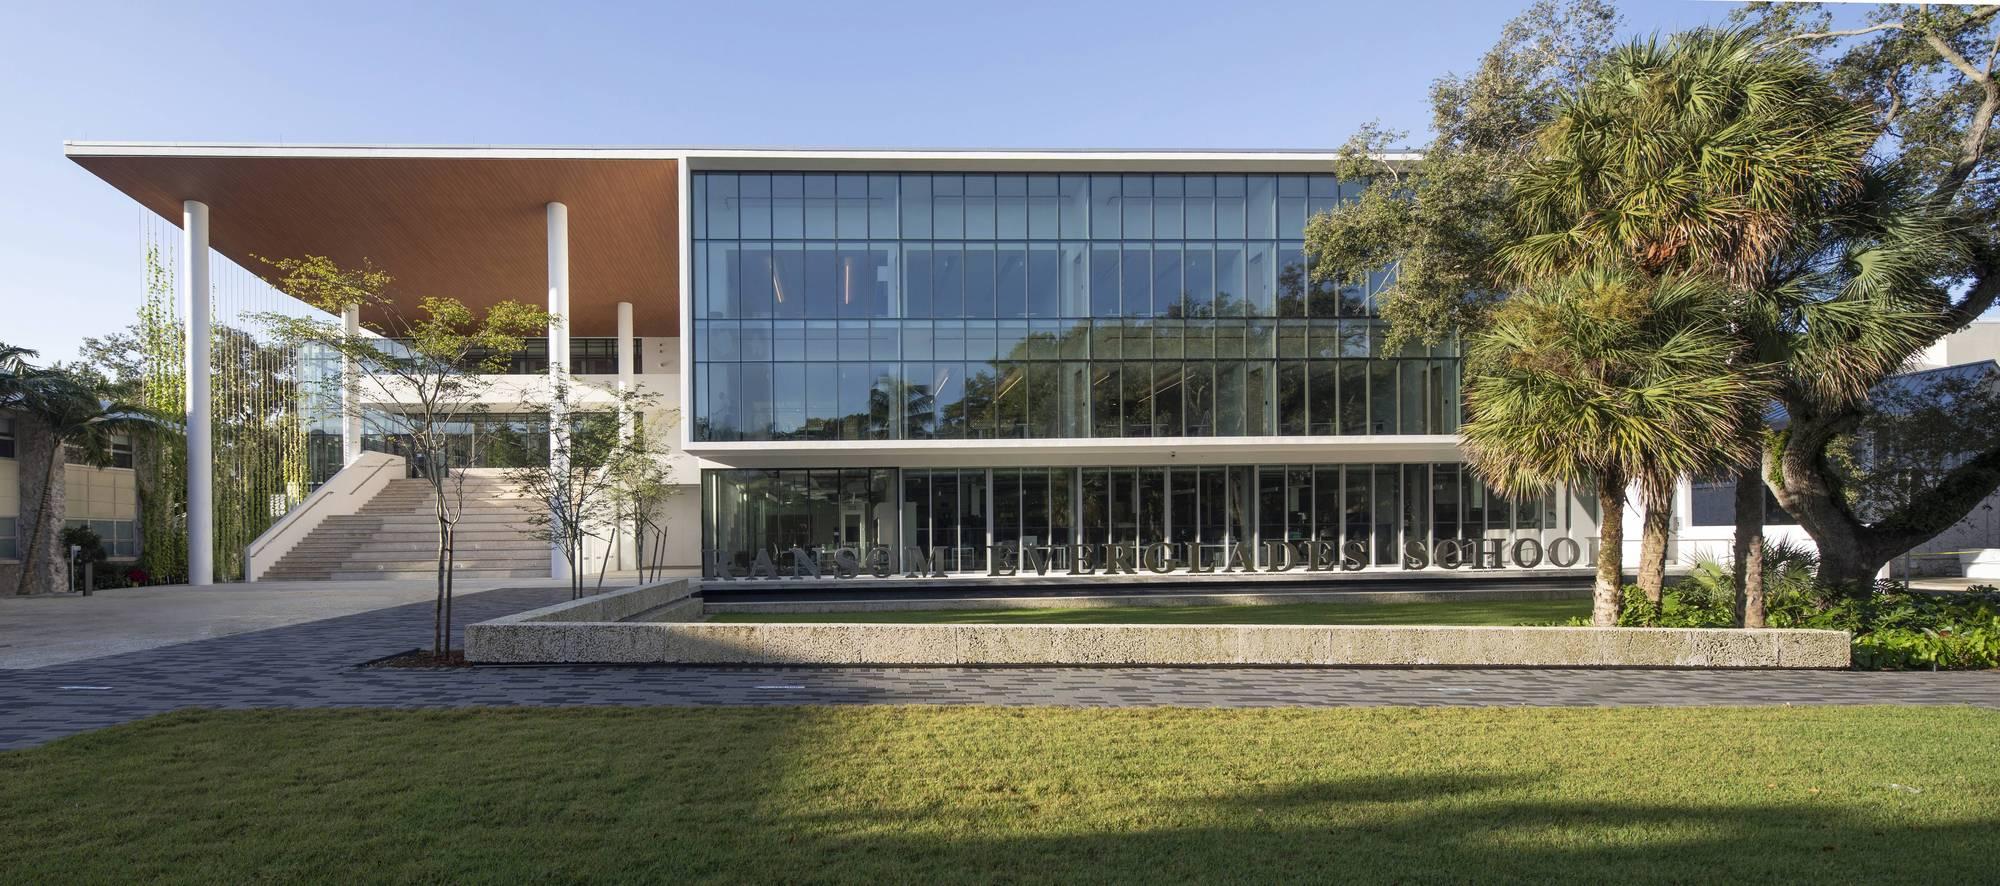 Ransom Everglades School STEM Building / Perkins&Will